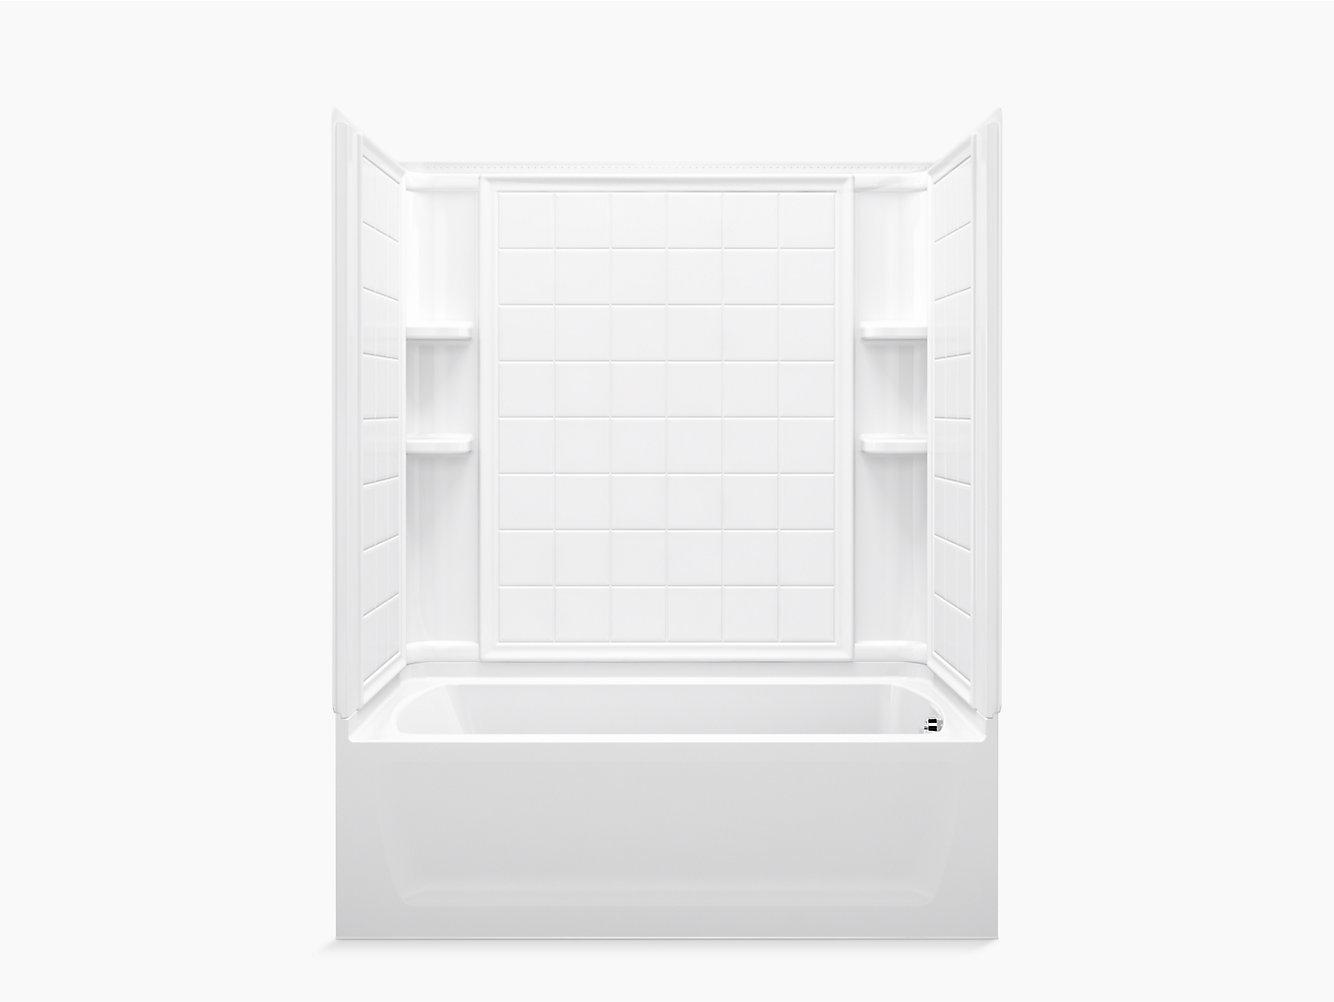 "Ensemble Series 7112, 60"" x 32"" Bath/Shower   71120120   STERLING"